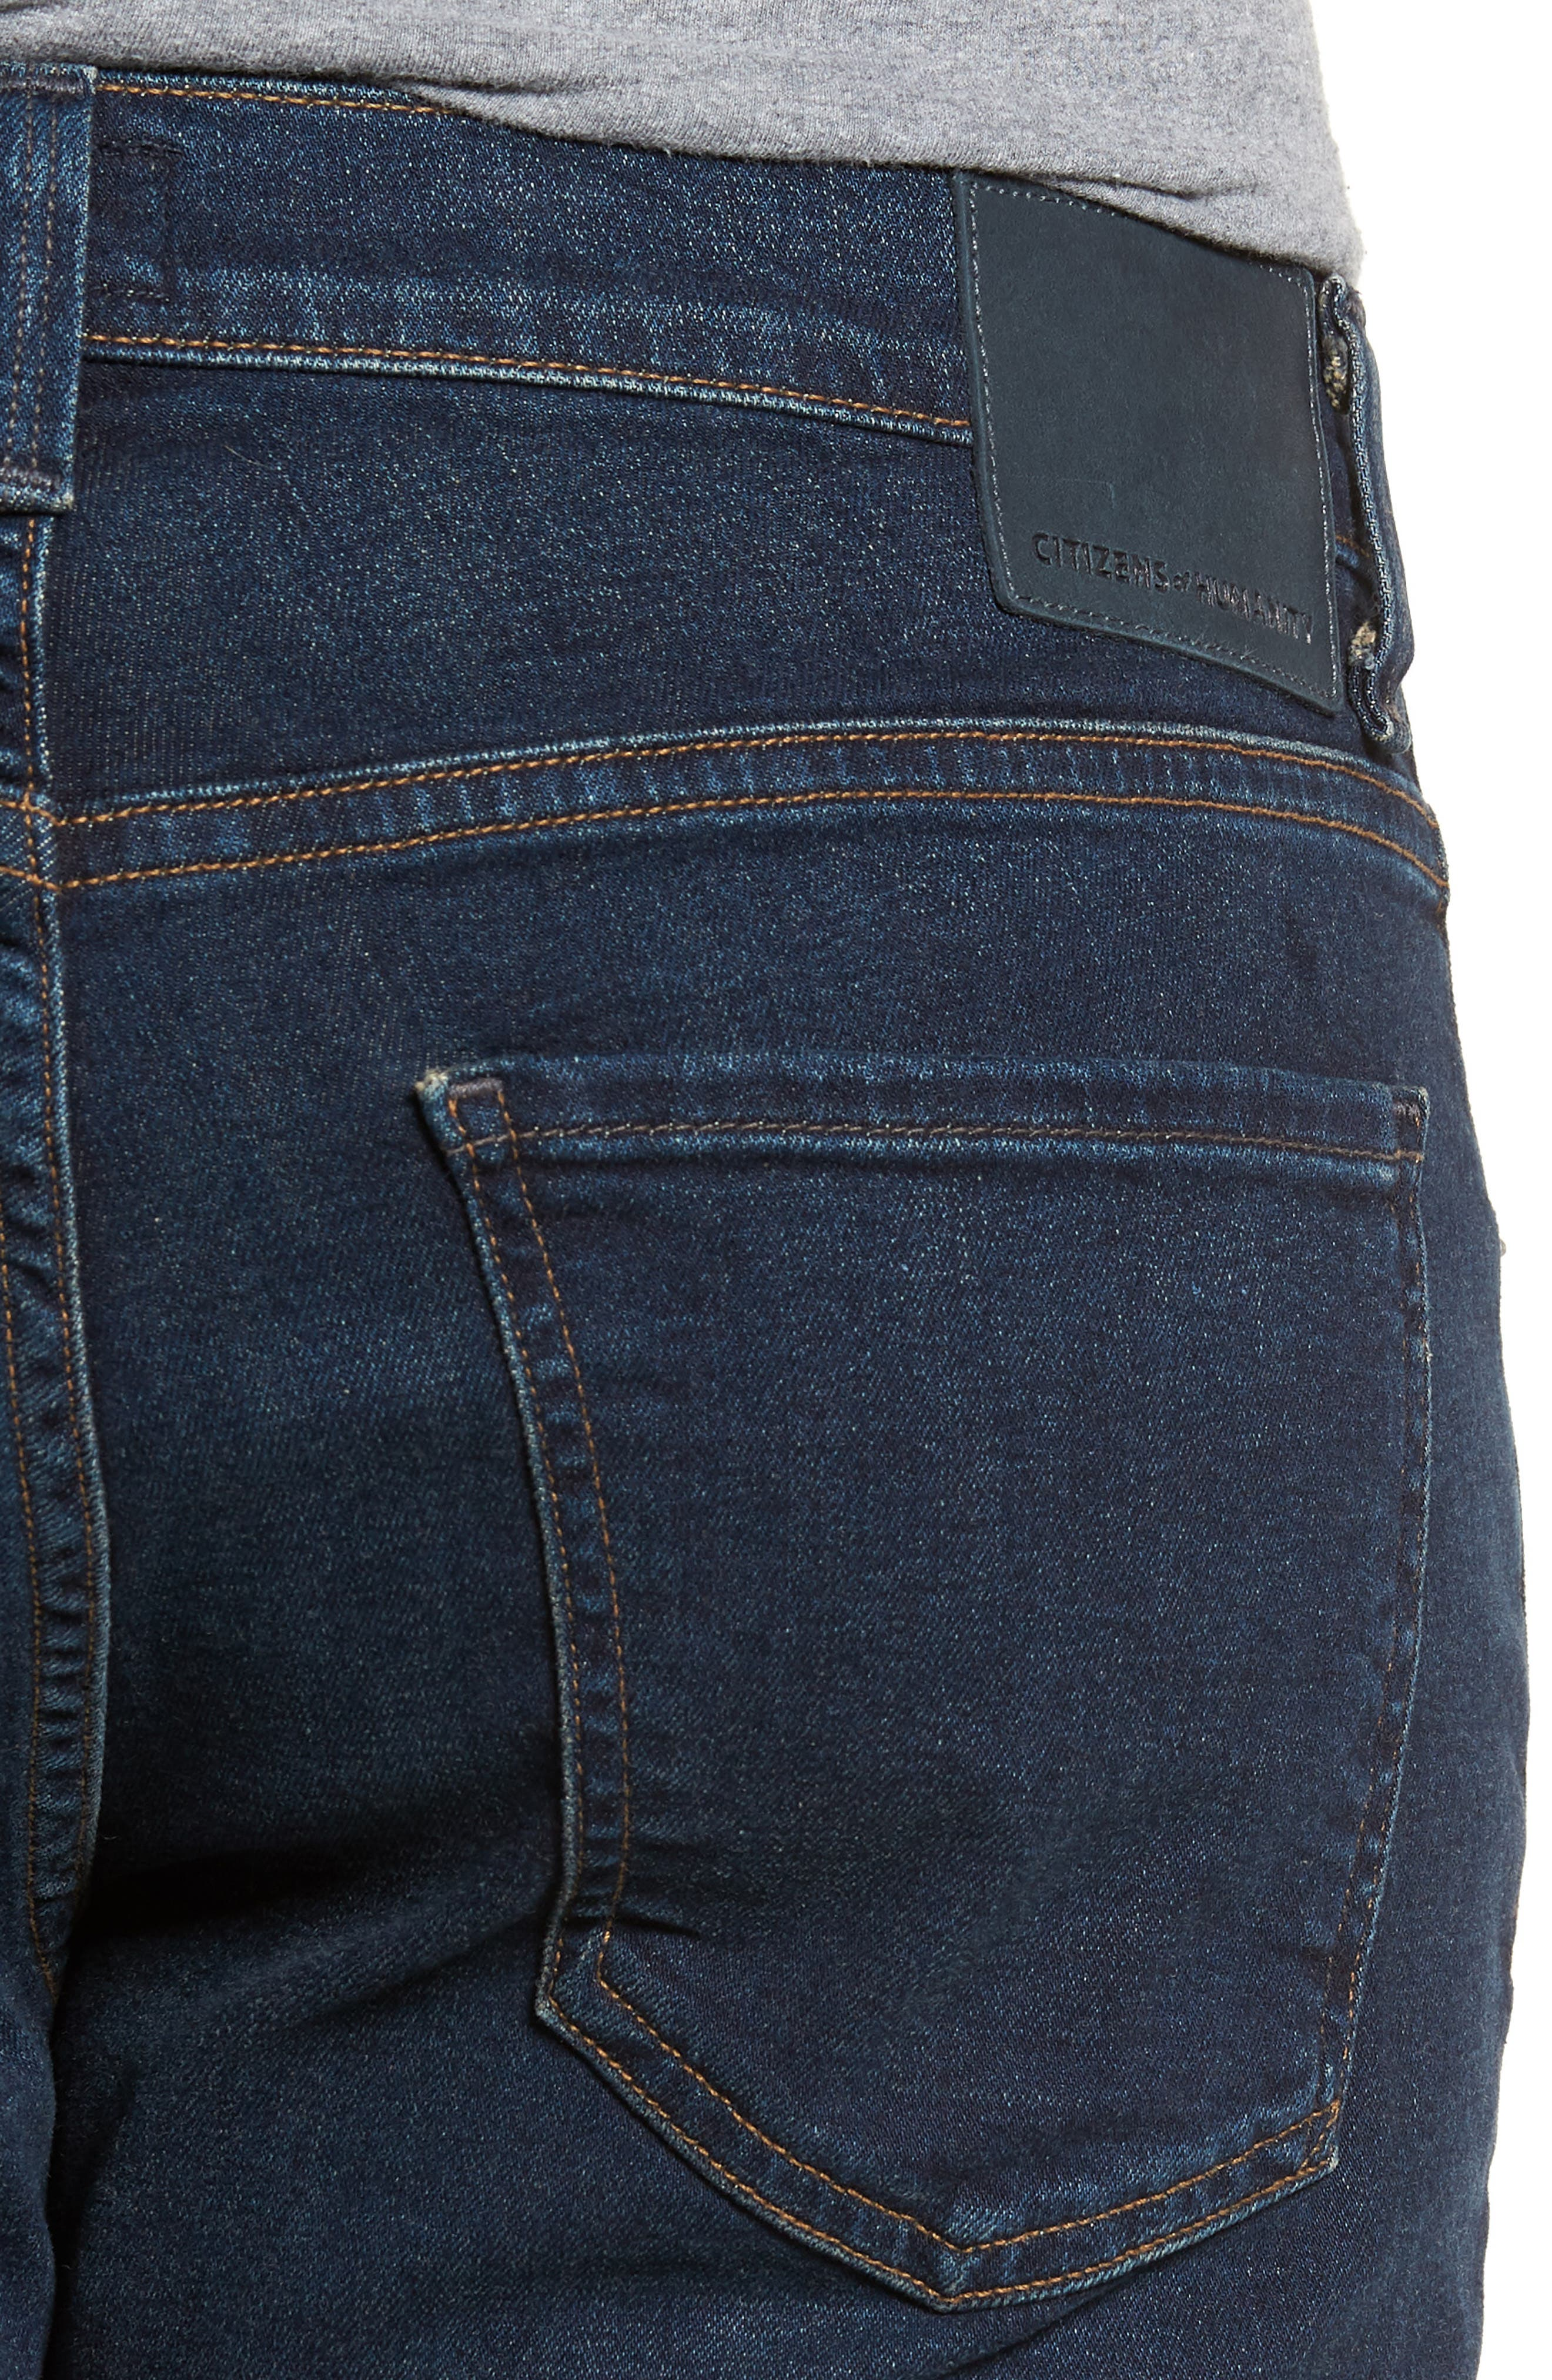 Perform - Sid Straight Leg Jeans,                             Alternate thumbnail 4, color,                             EVERSON